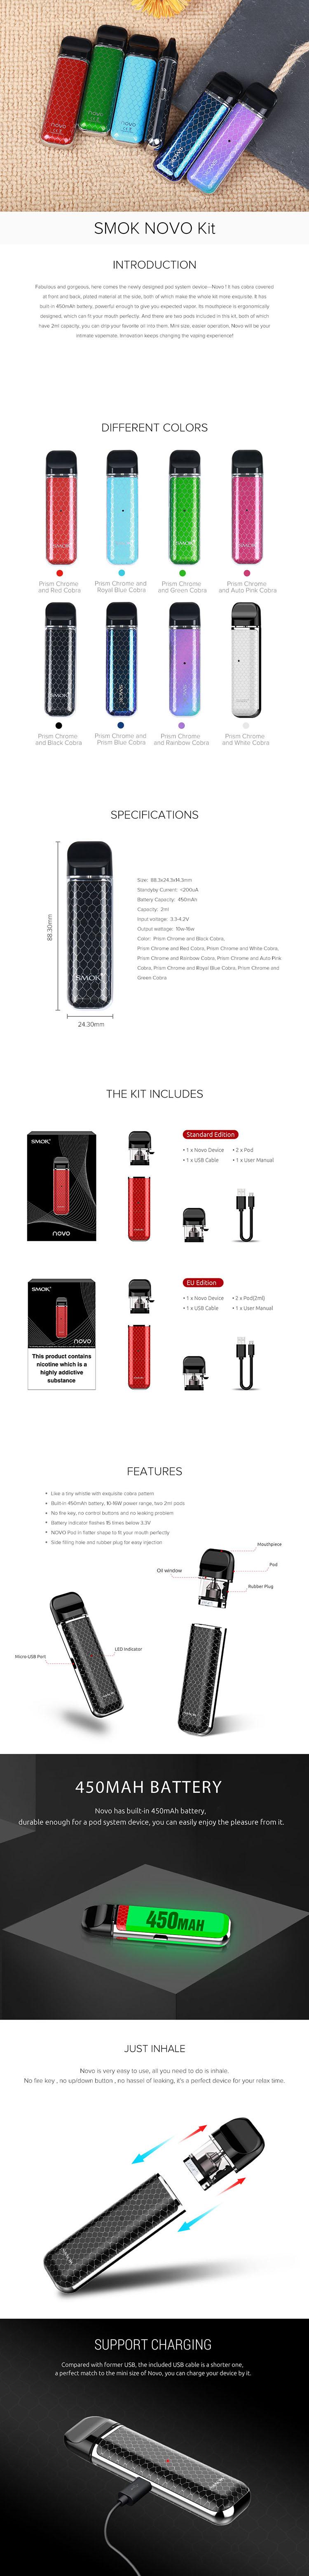 SMOK NOVO Pod System Kit 450mAh